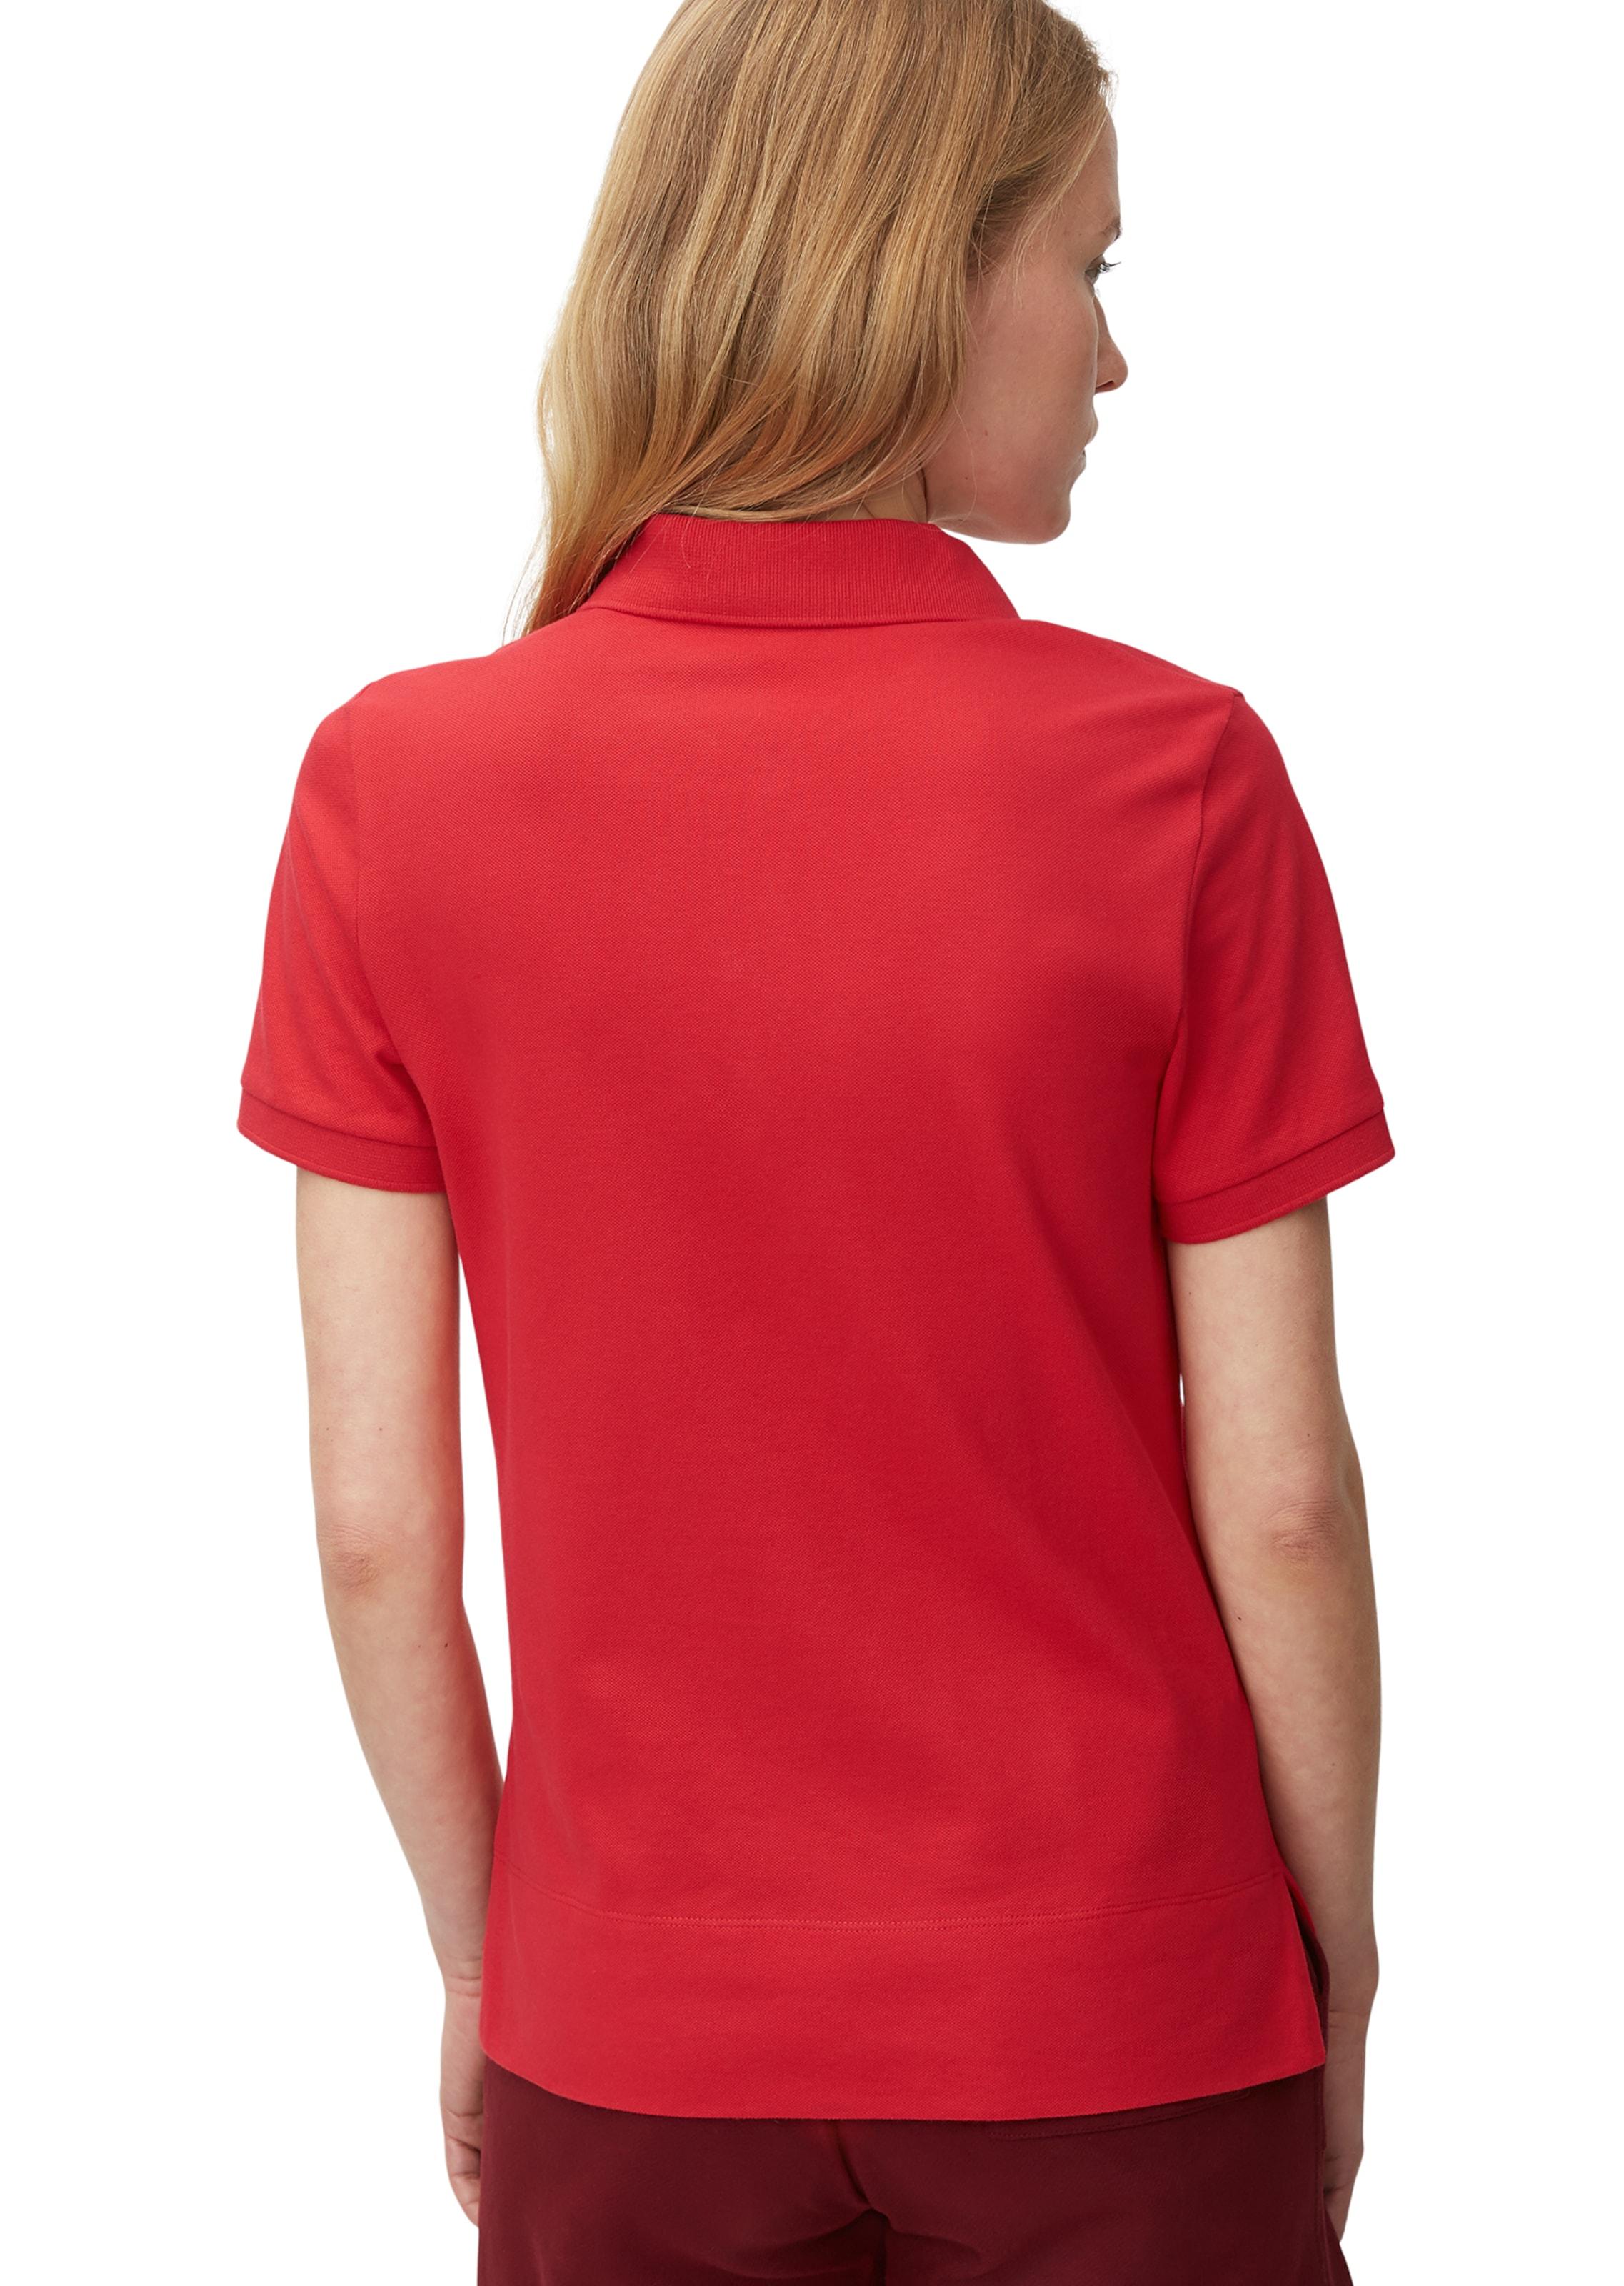 Shirt Shirt In Marc O'polo O'polo O'polo Marc In RotSchwarz In RotSchwarz Marc Shirt Ygy6f7b